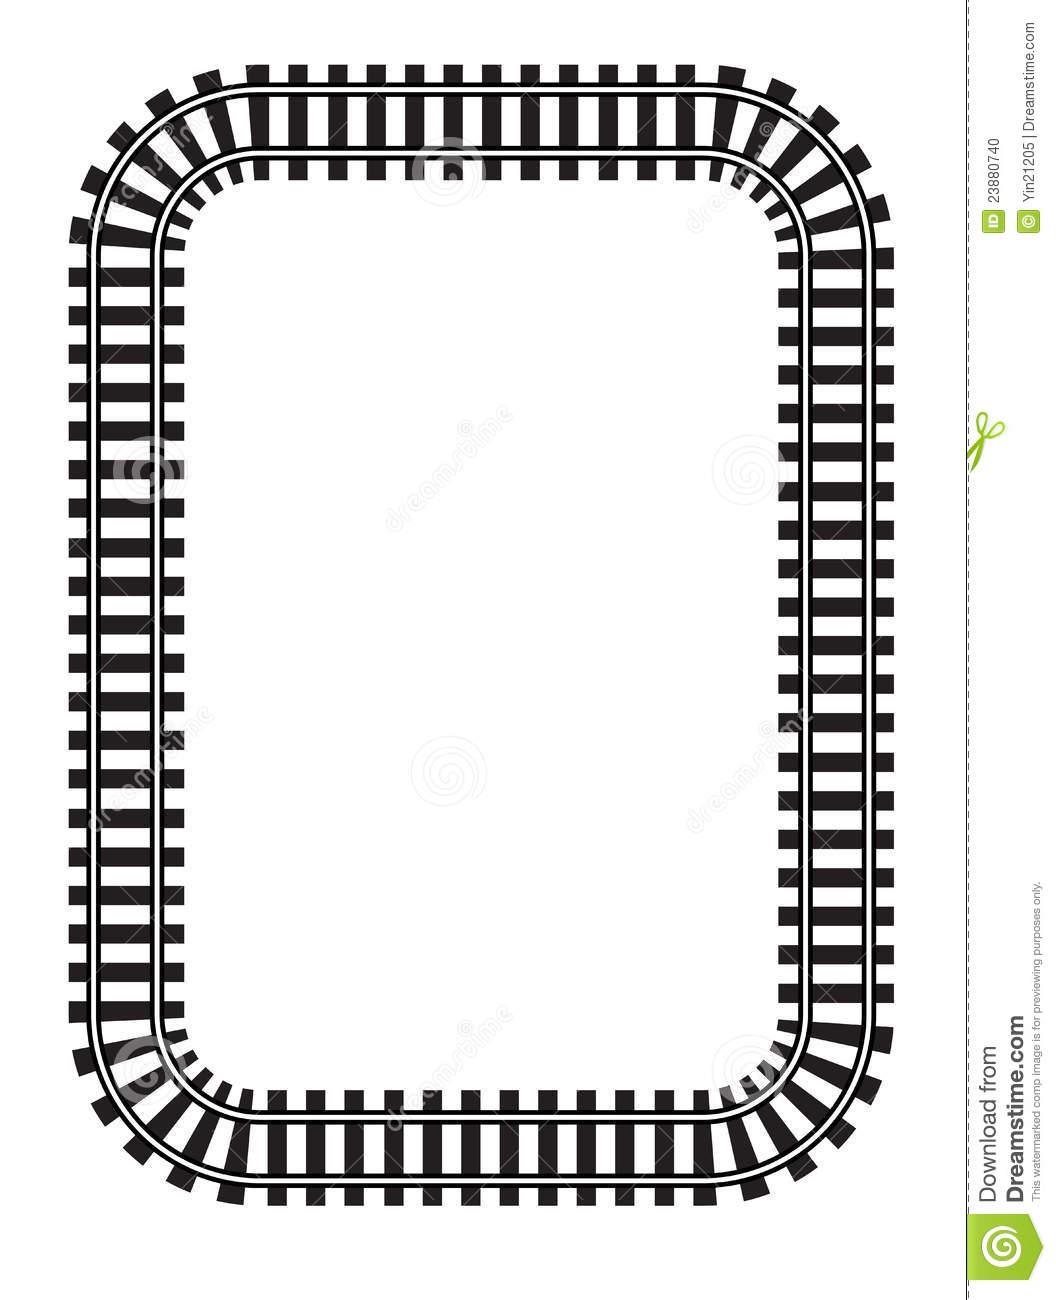 Clip Art Train Track Clipart train track border clipart panda free images